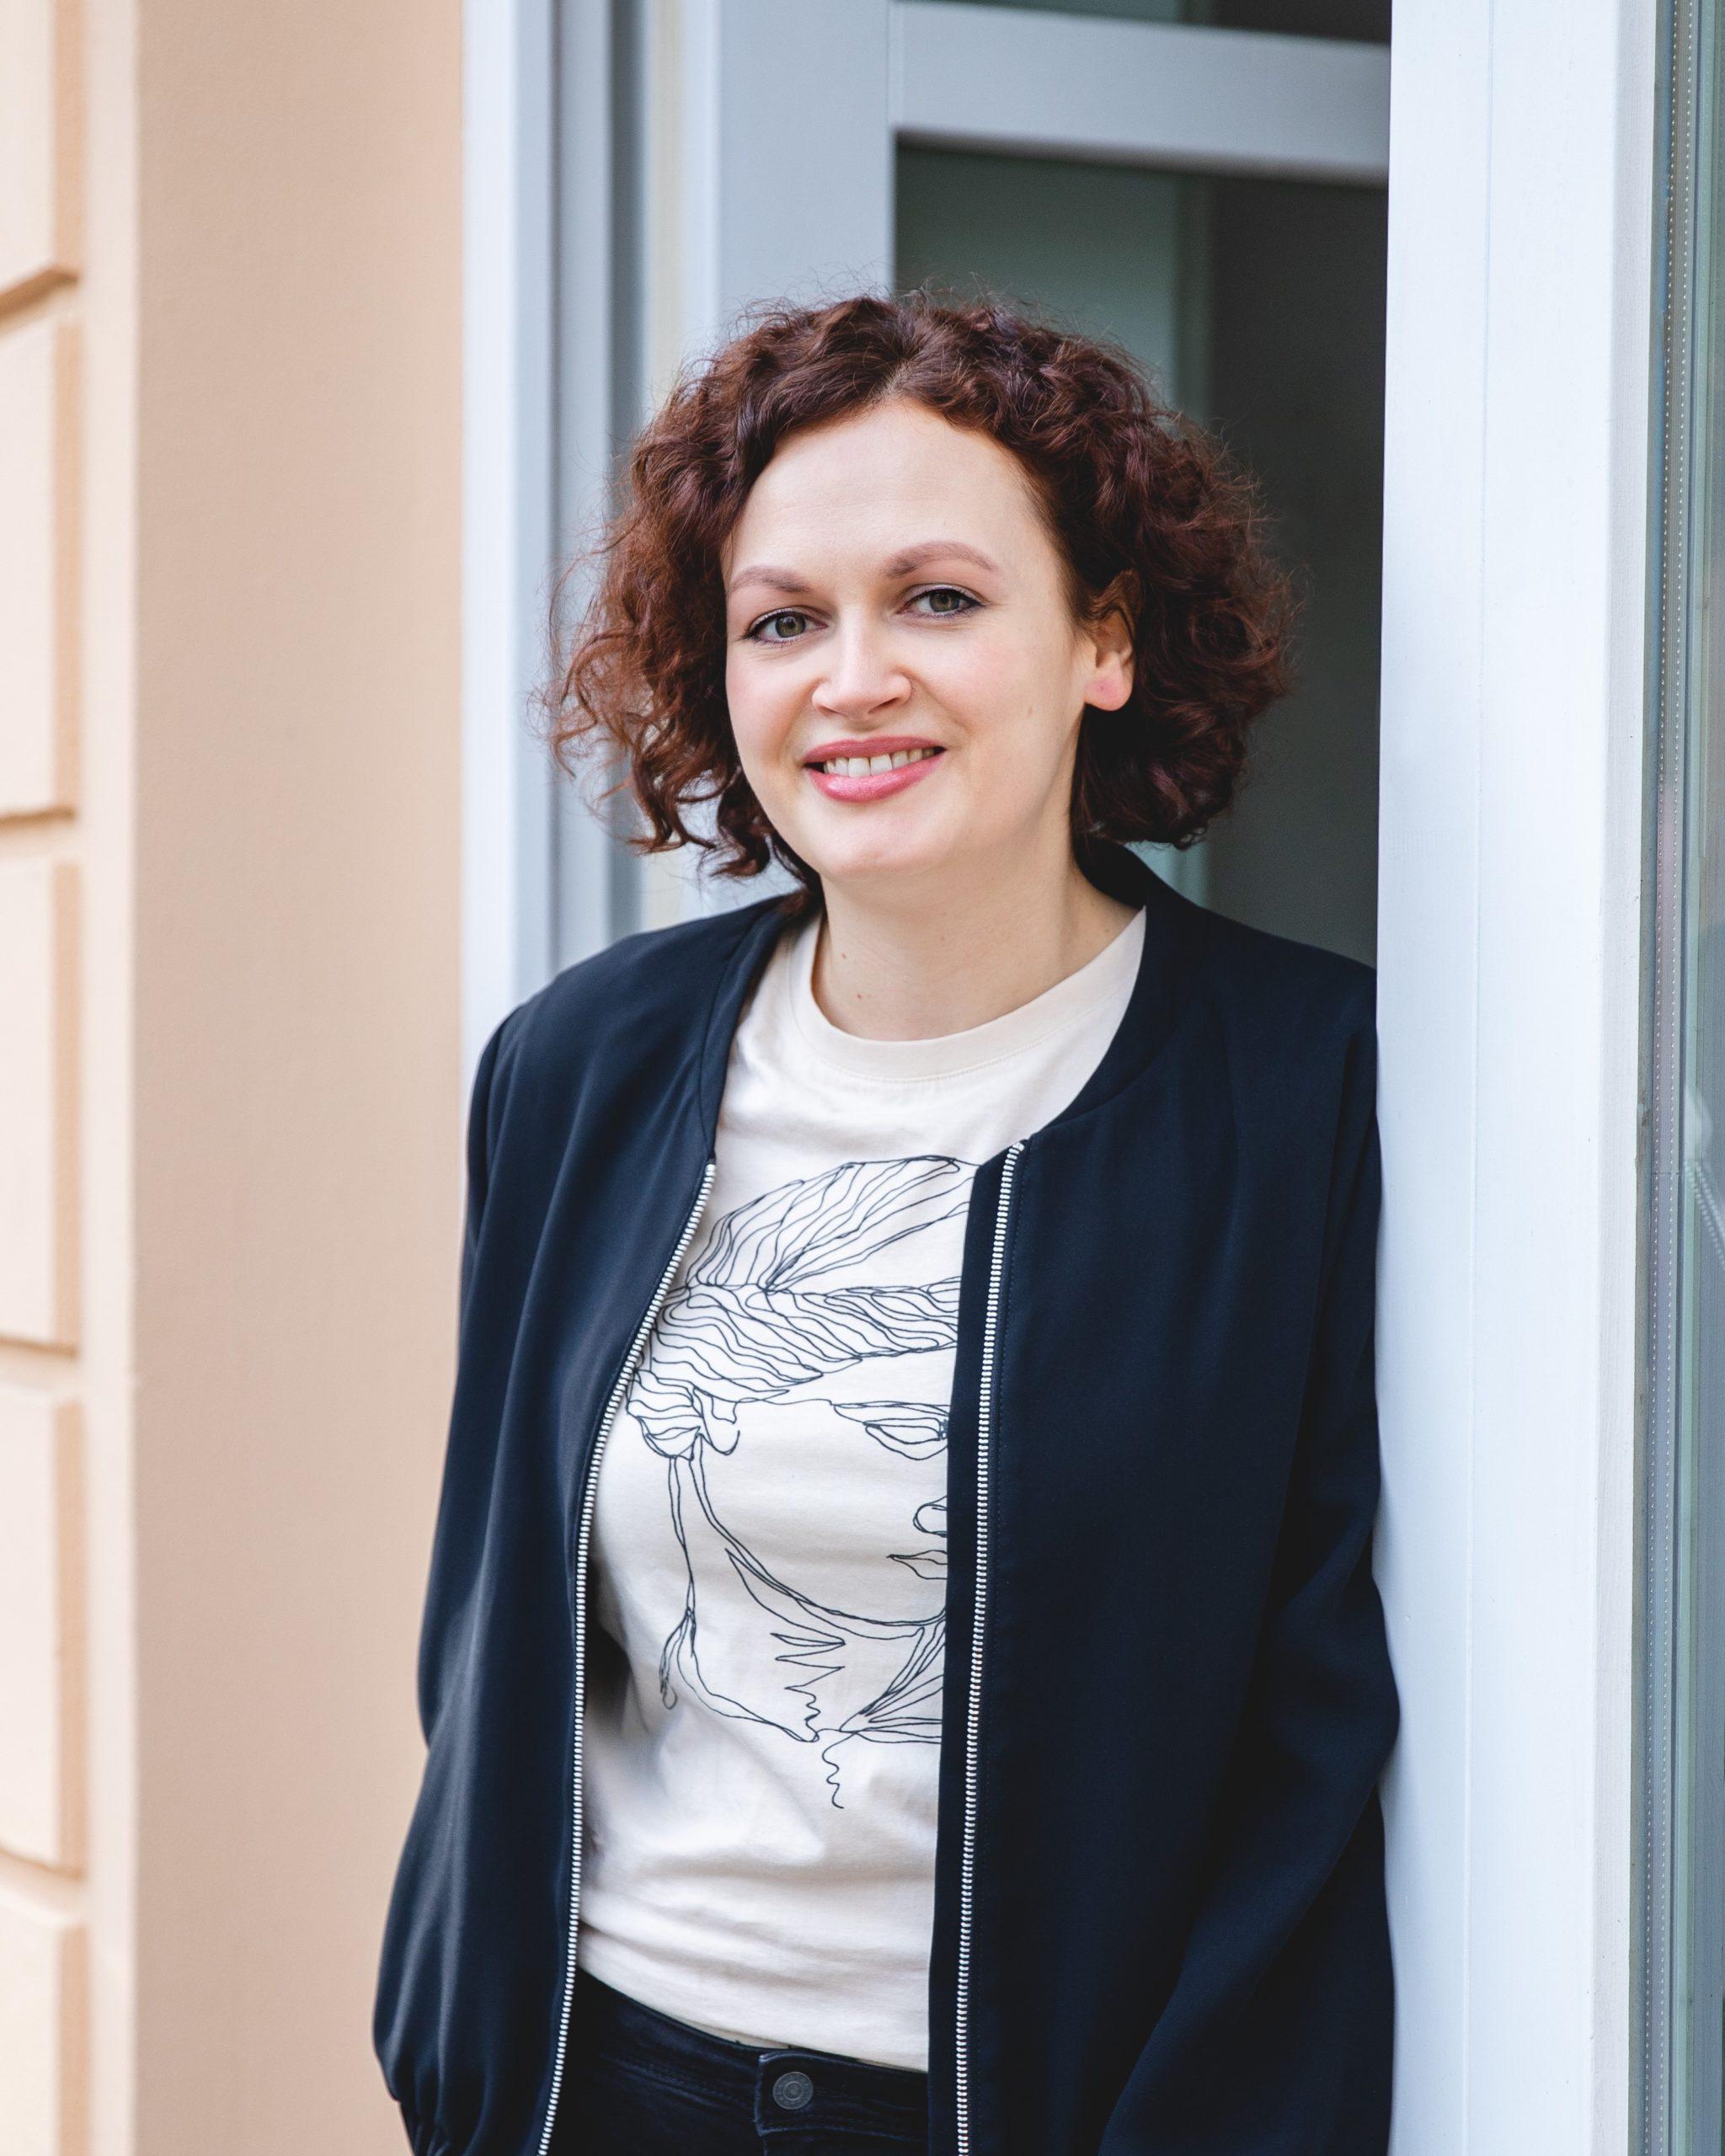 Dr. Lina Strauss Lektorin und Texterin Berlin